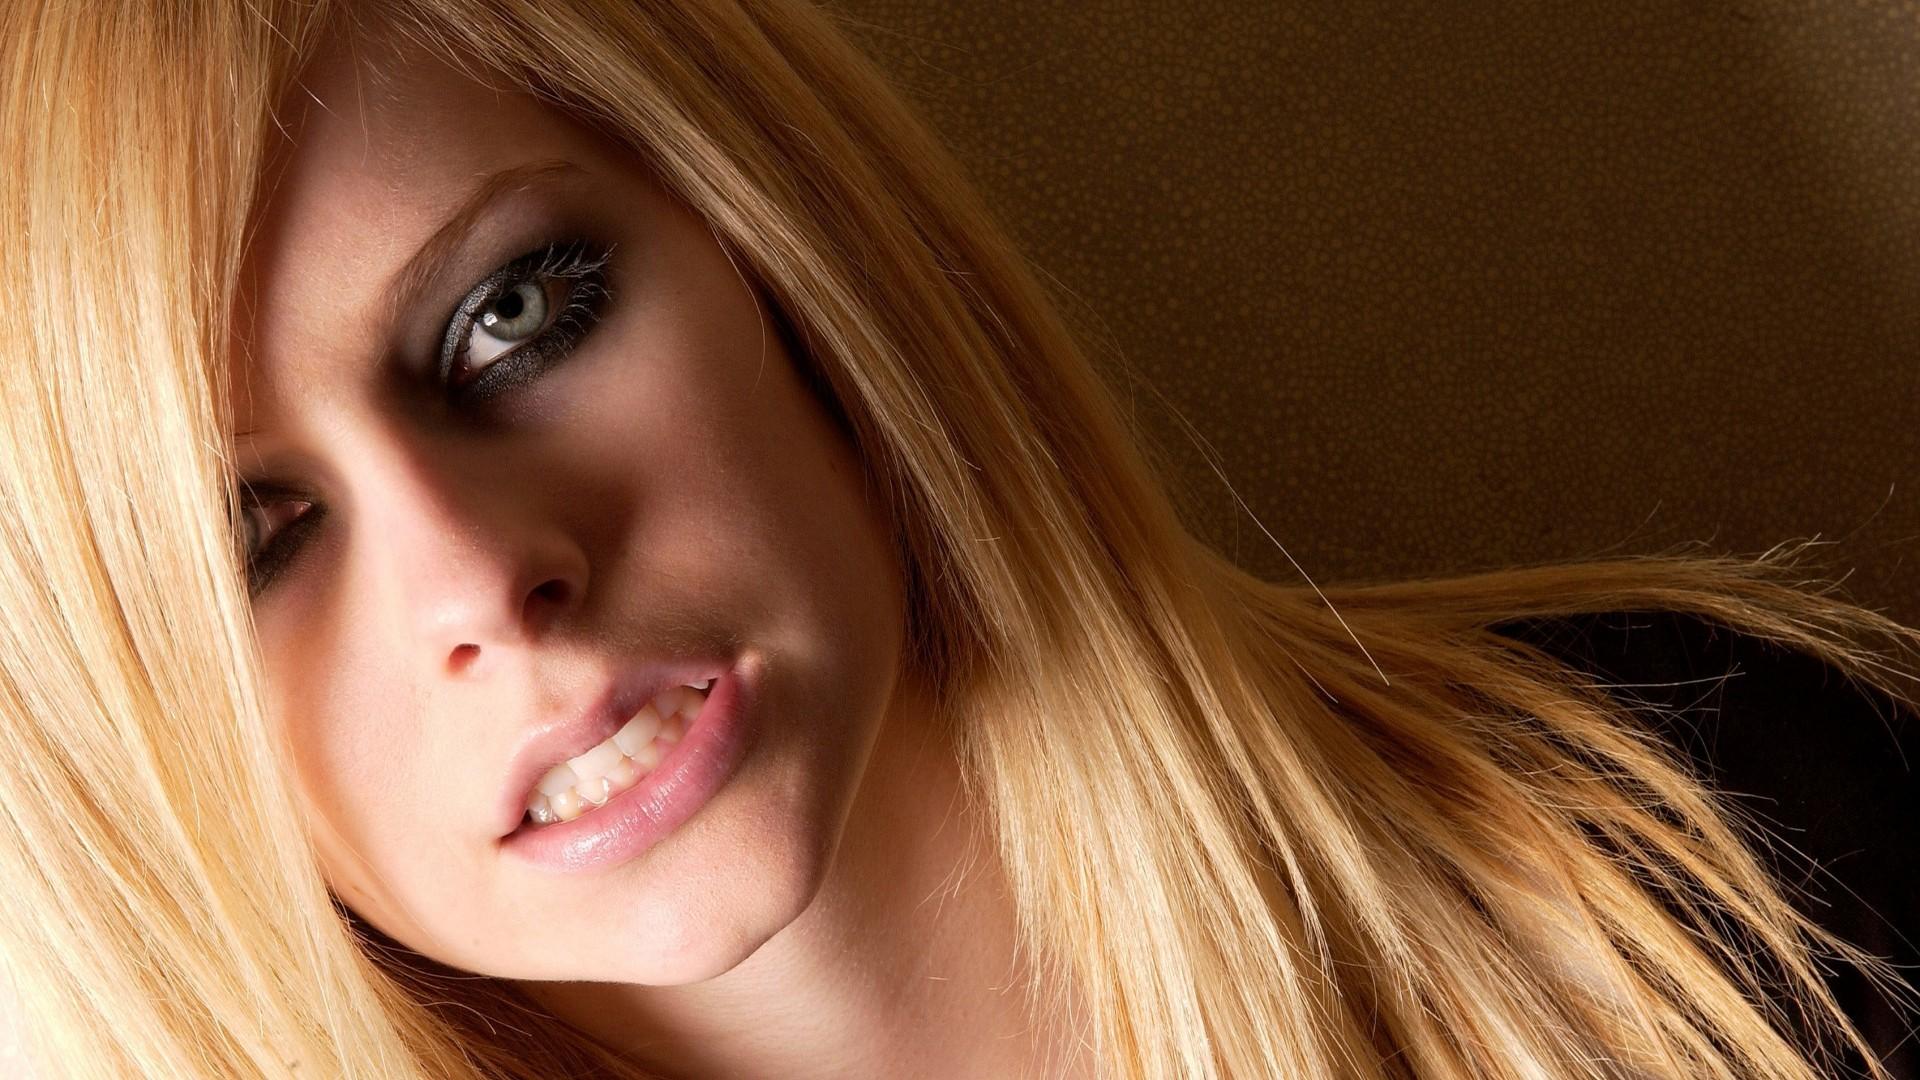 Beautiful Expersion Girl Wallpapers Wallpaper Face Women Model Blonde Long Hair Red